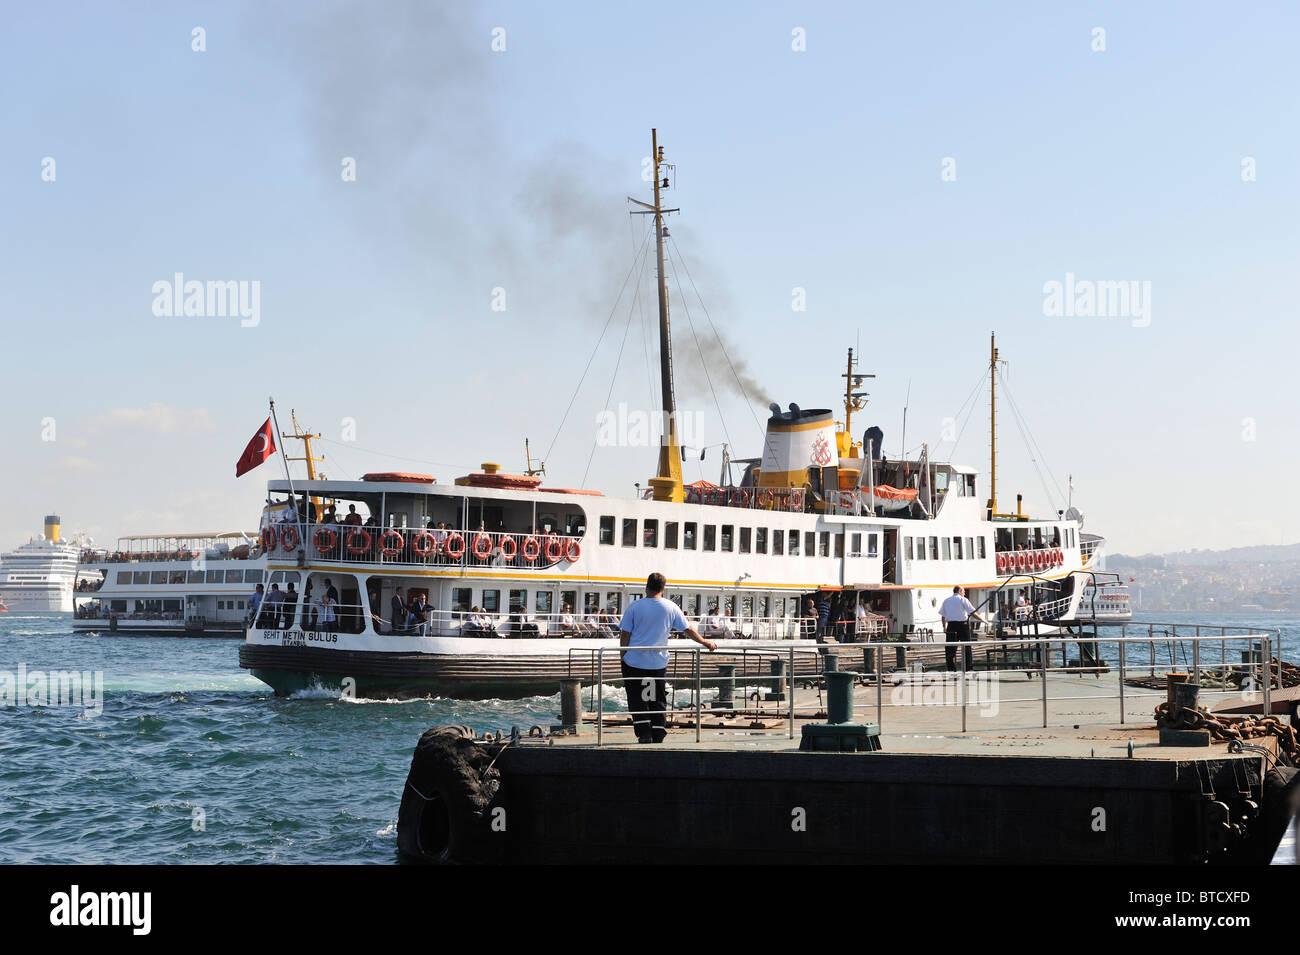 Ferry, dock, Golden Horn, İstanbul, Turkey 100916_35985 - Stock Image